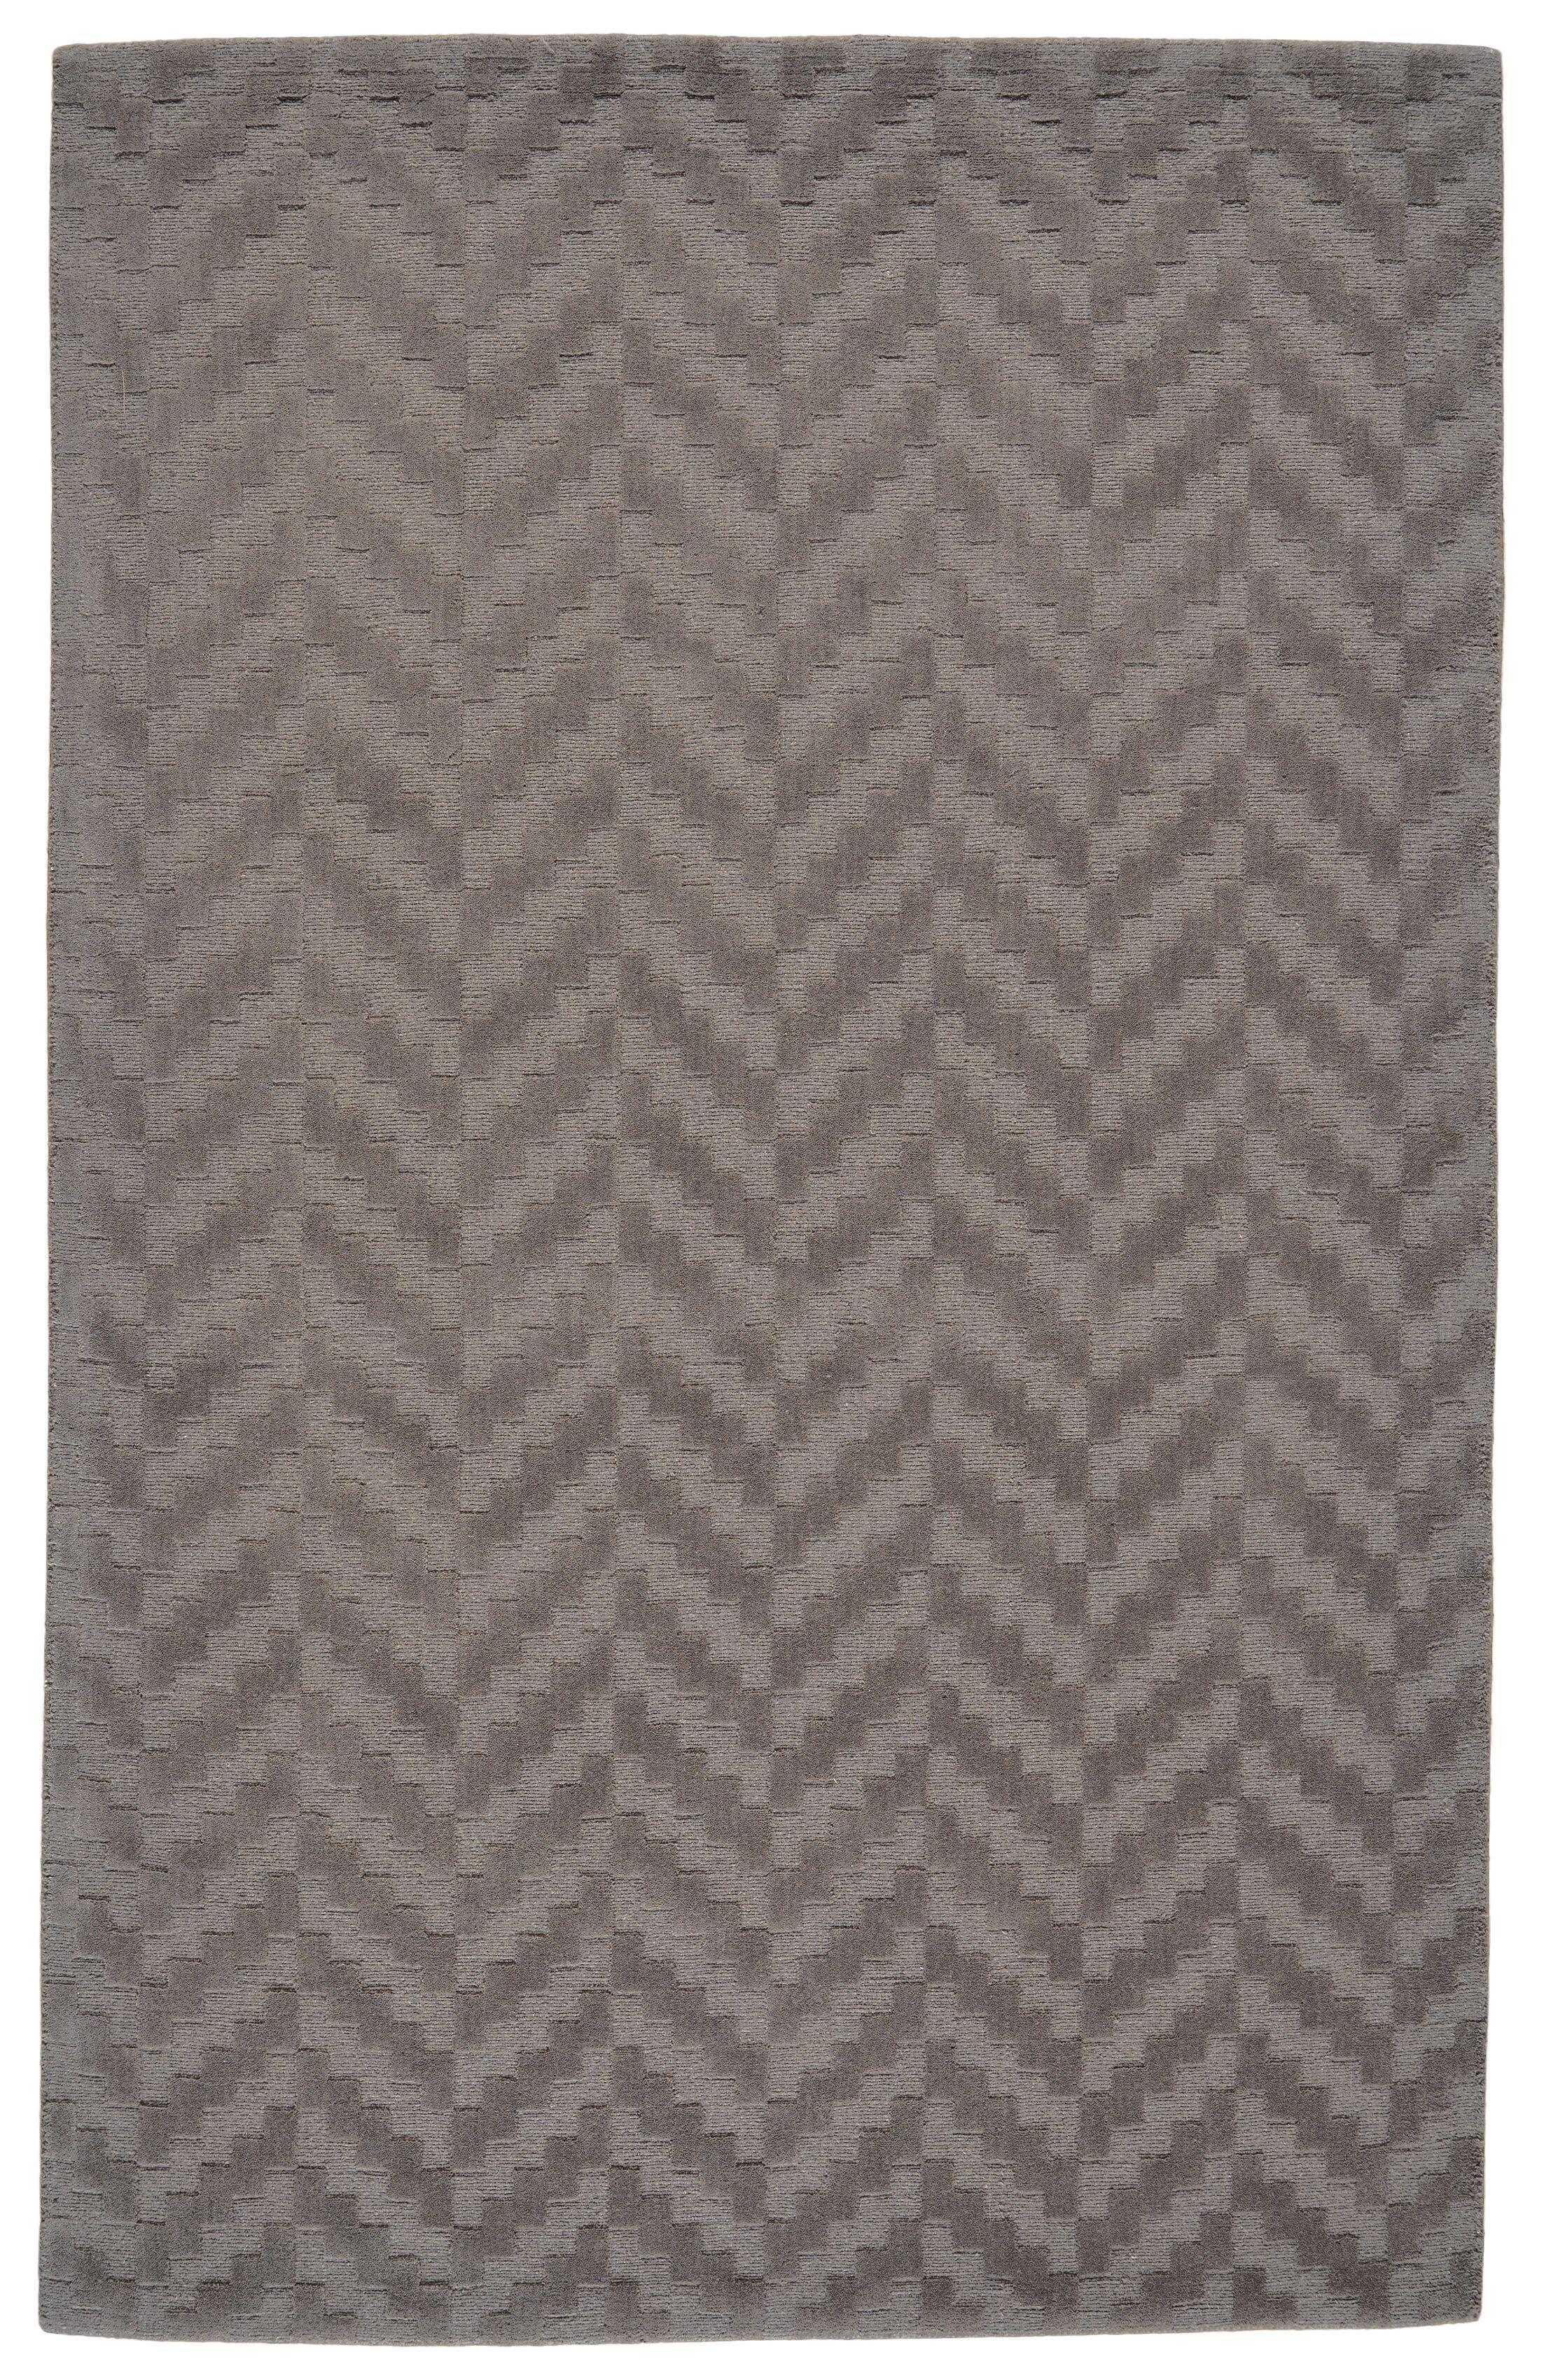 Mcnab Hand-Tufted Wool Slate Area Rug Rug Size: Rectangle 8' x 11'